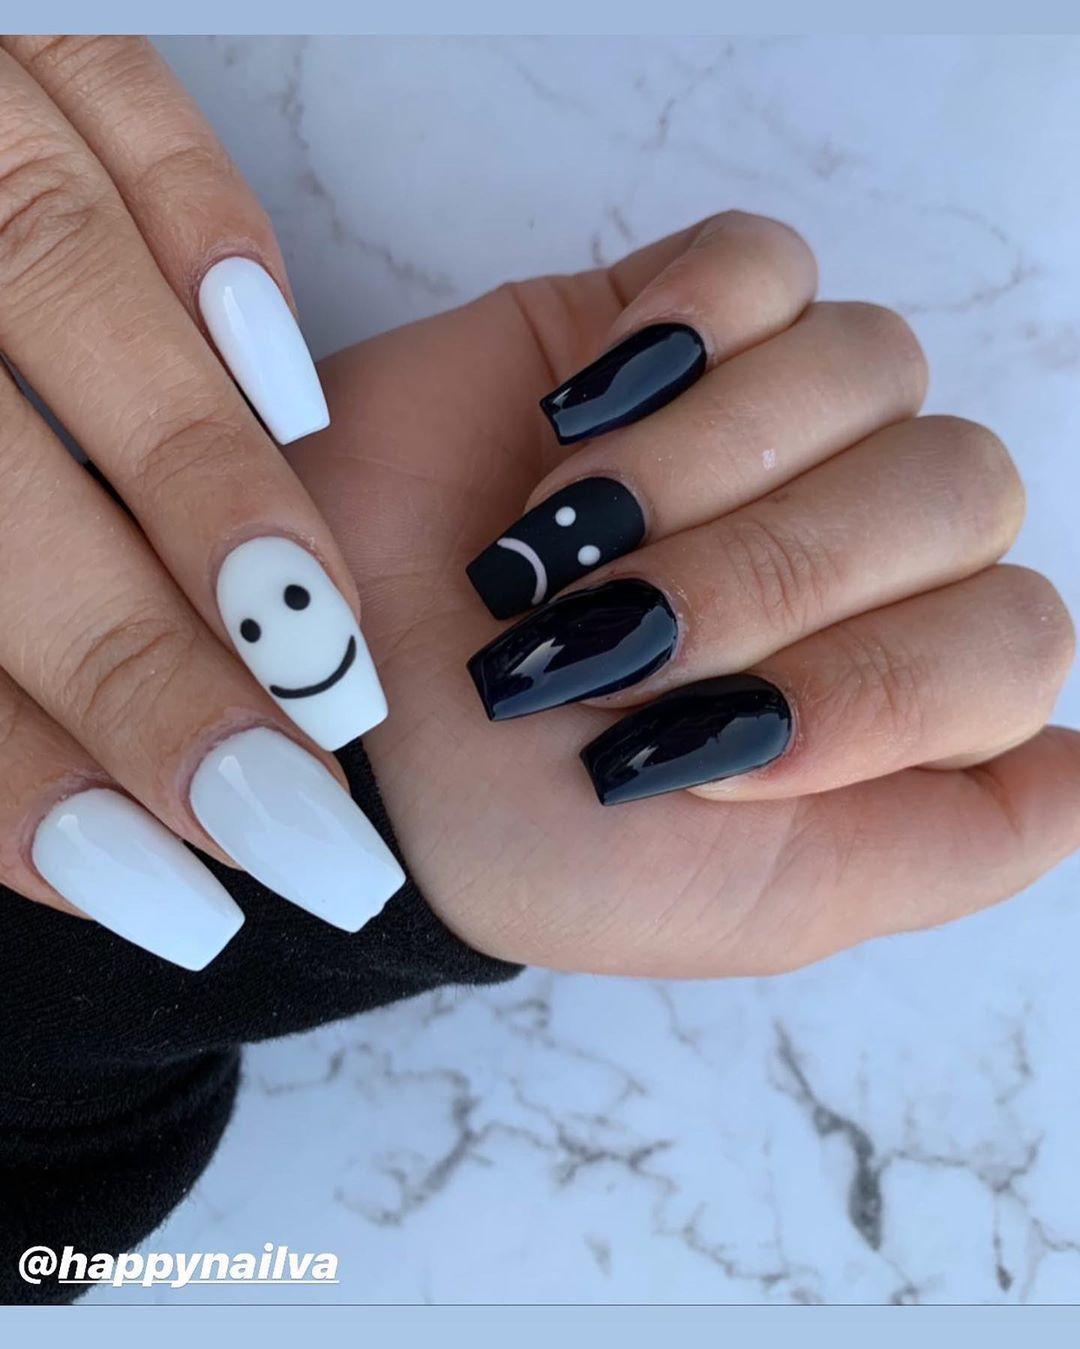 Https I Pinimg Com Originals D8 4e F3 D84ef30ac6b7e266bc046d3d8abe620f Jpg In 2020 Short Acrylic Nails Designs White Acrylic Nails Black Acrylic Nail Designs